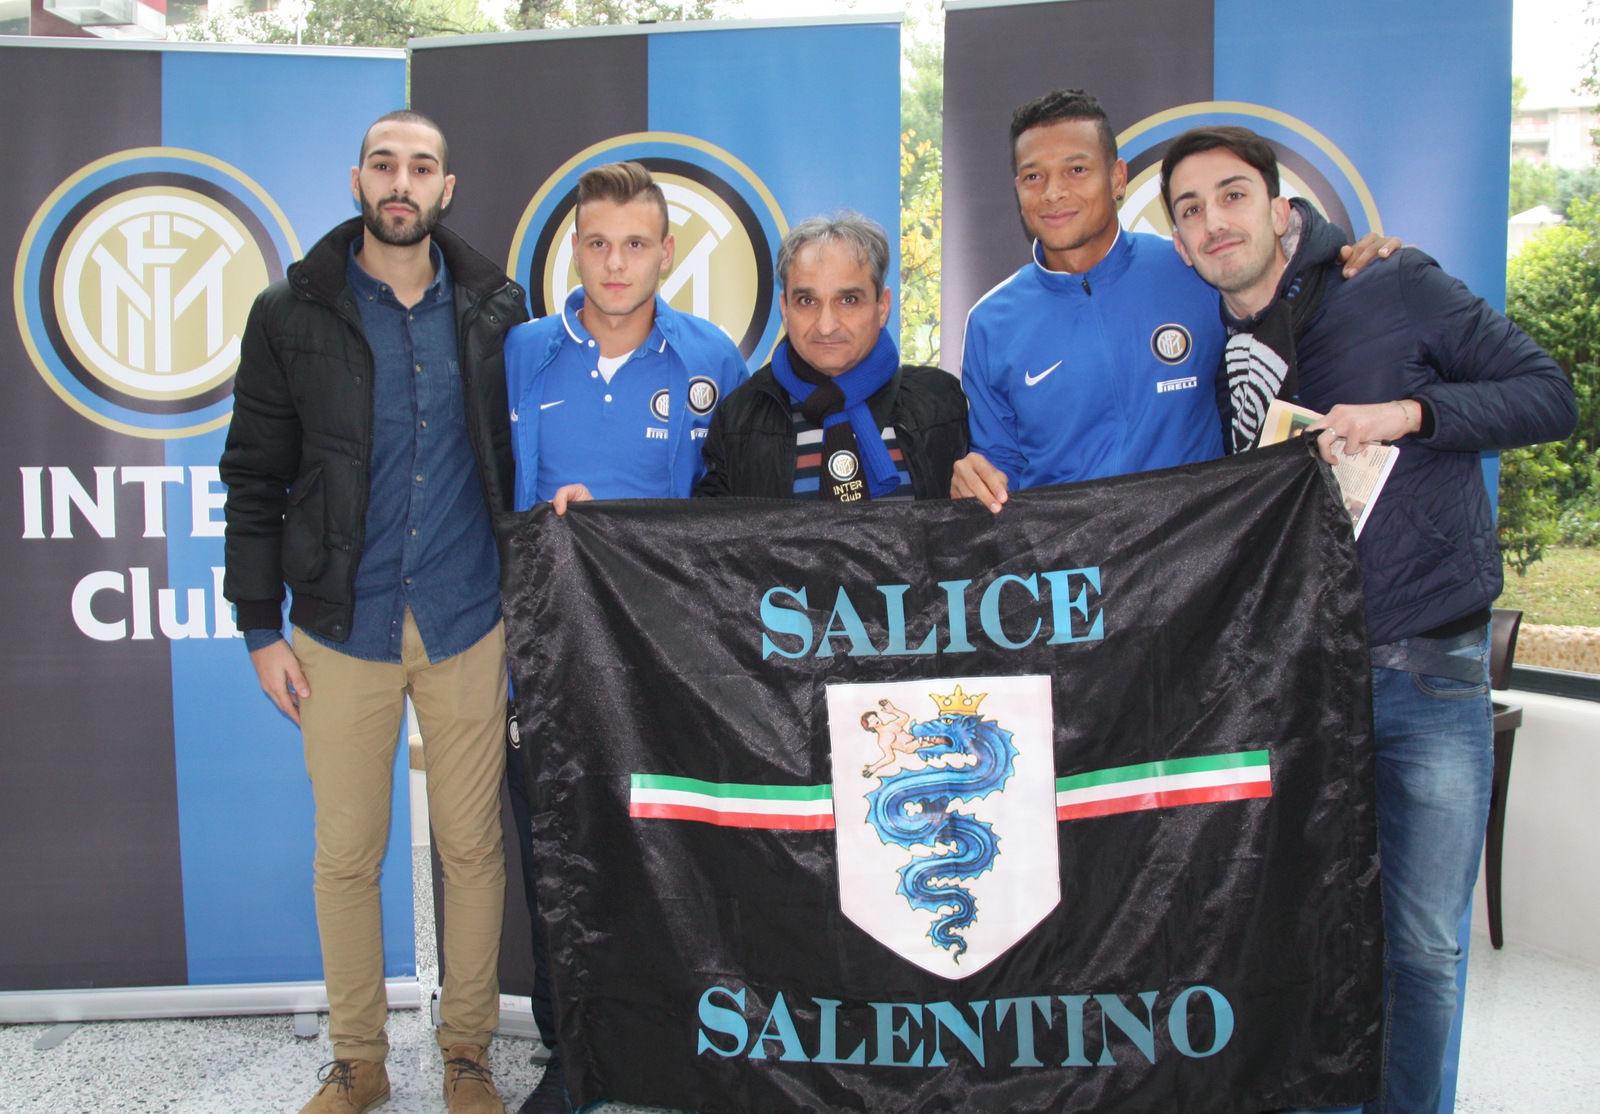 Meet & Greet Inter Club di Bari